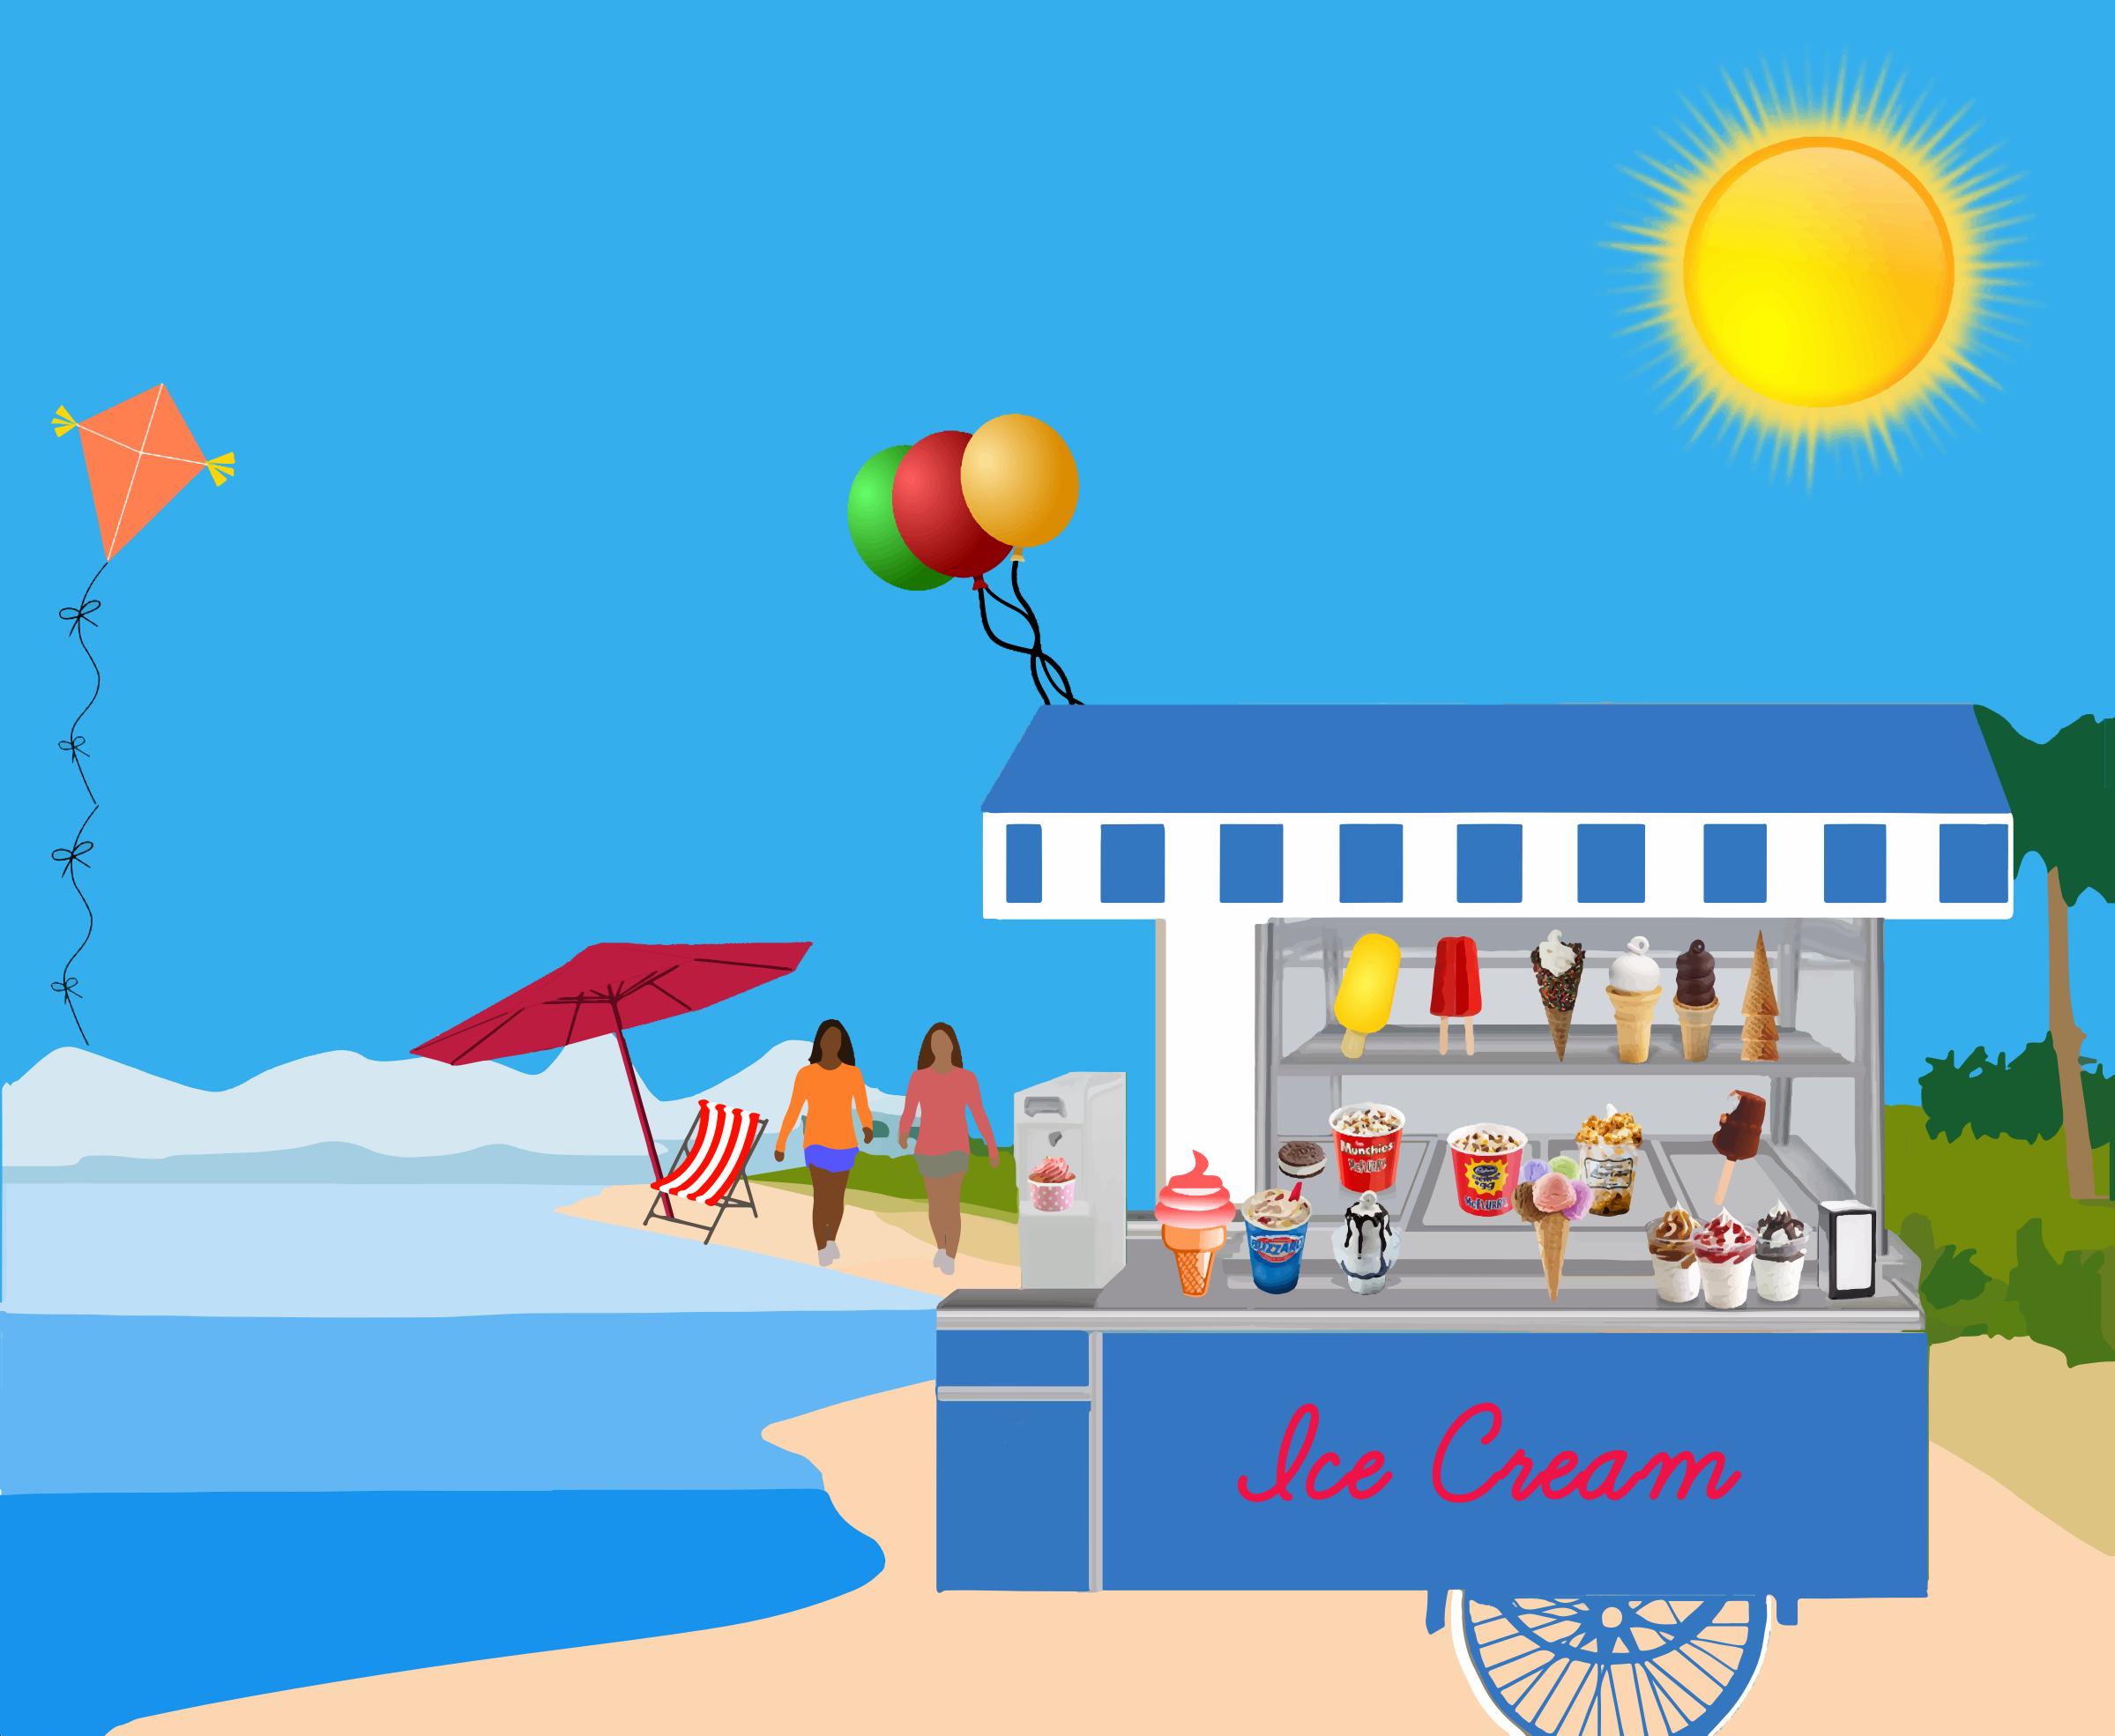 Ice Cream Cart on Beach vector clipart image - Free stock ...